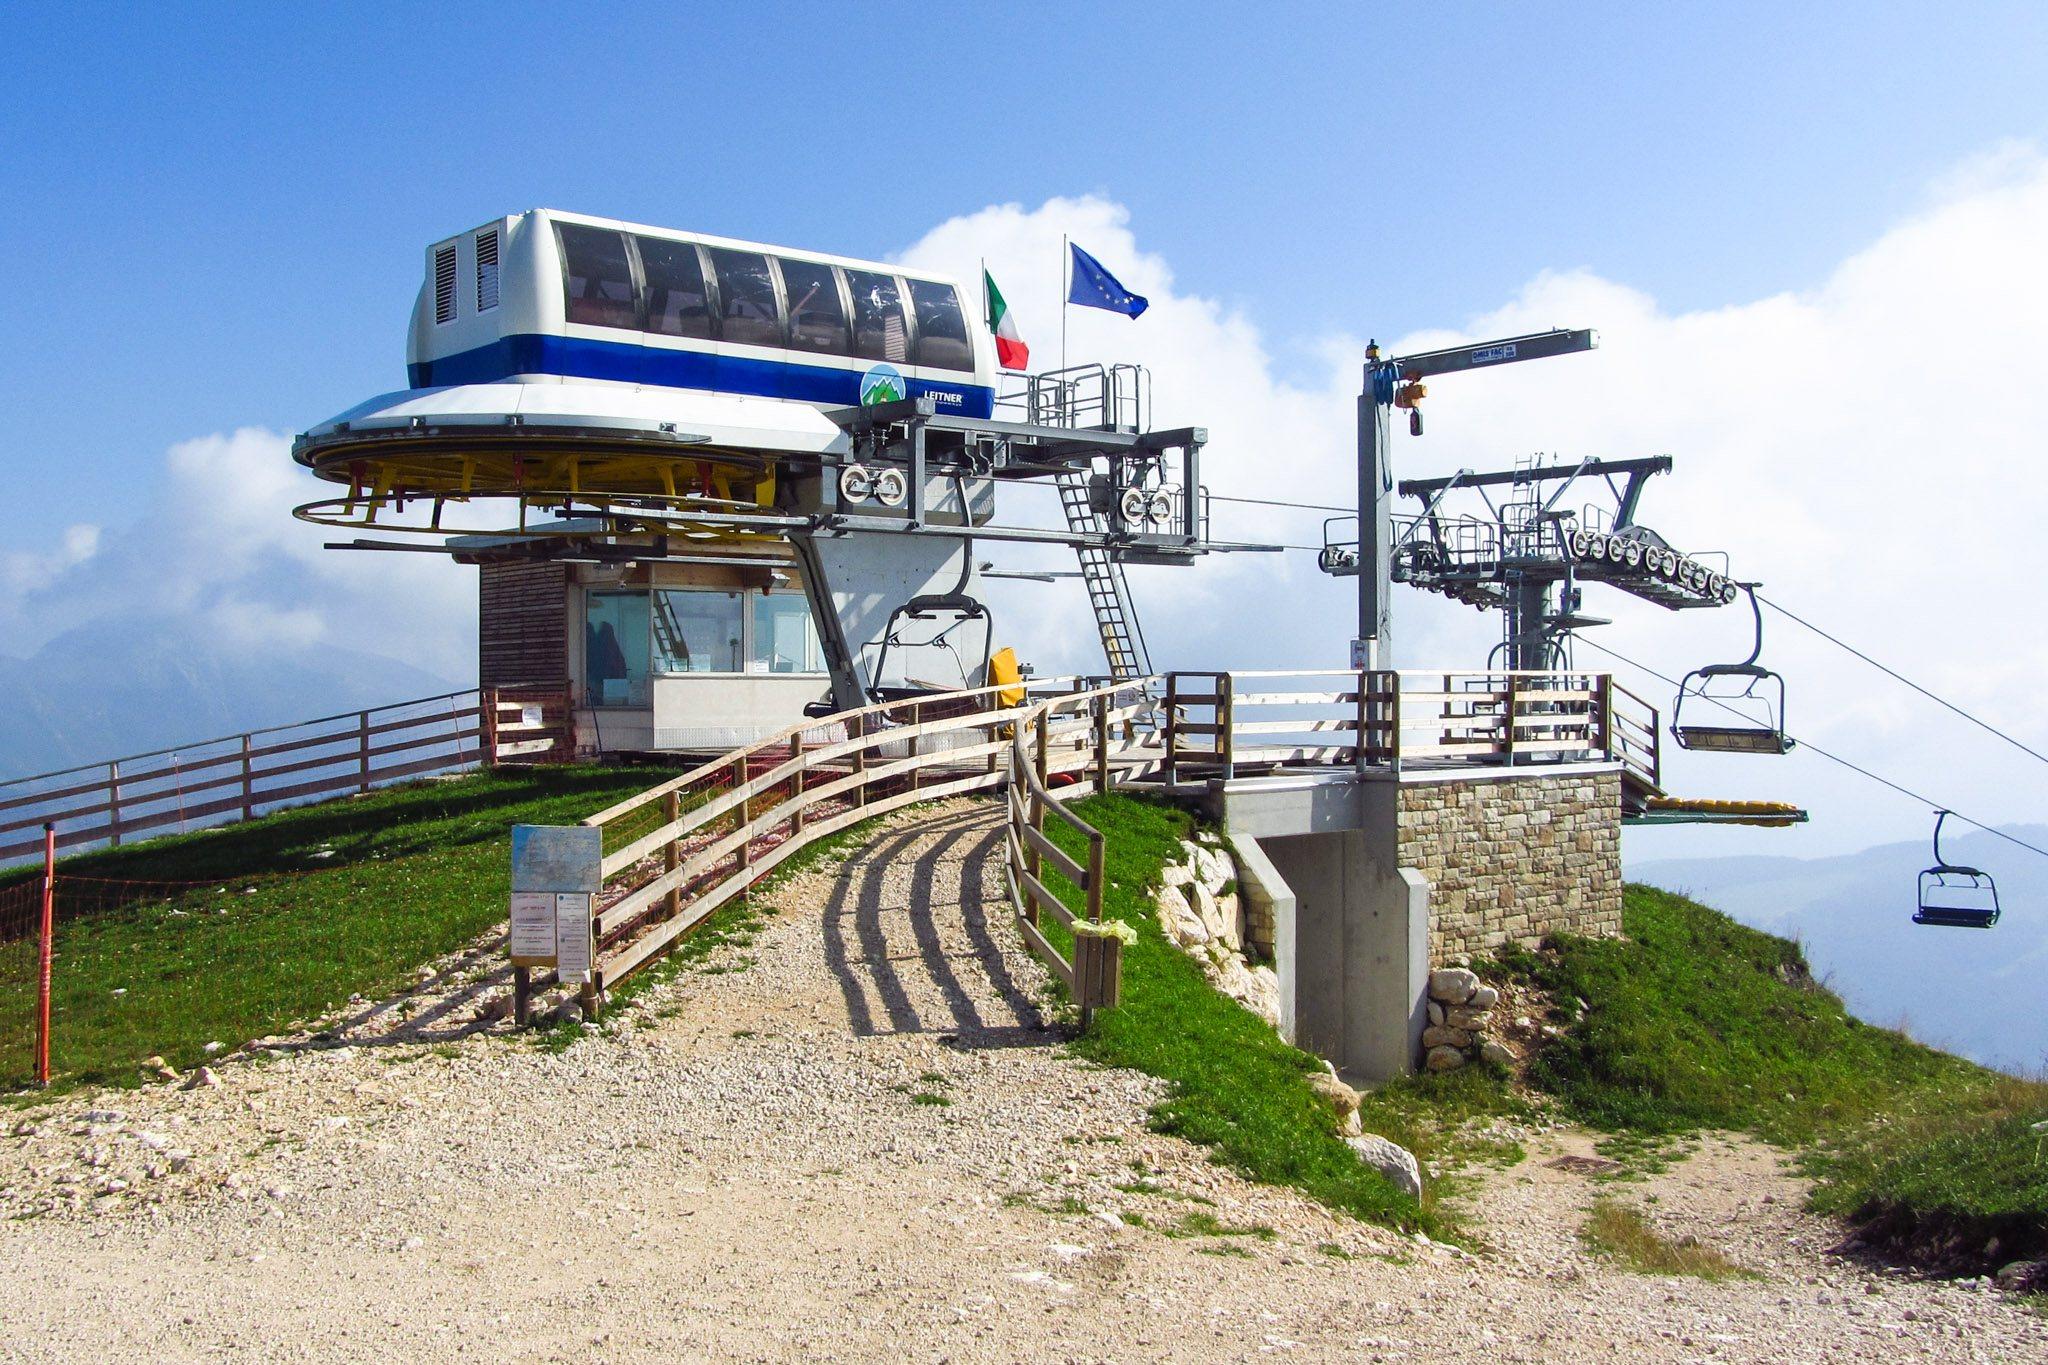 Die Bergstation des Sessellifts Pra Alpesina